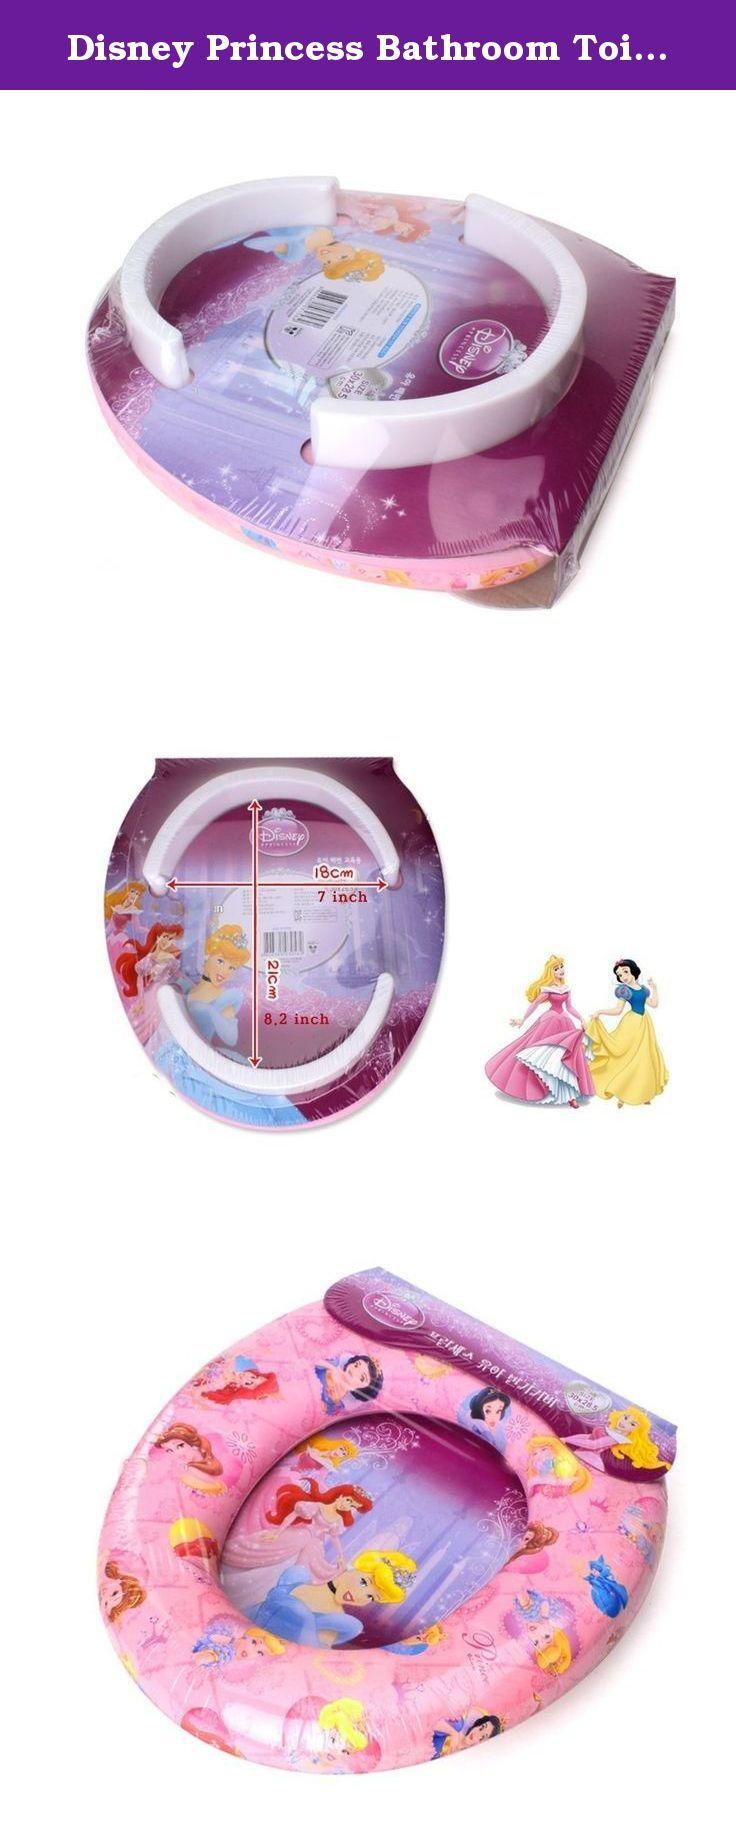 Disney Princess Bathroom Toilet Training Children Kids Potty Bidet Soft Seat Cover. Toilet Training Seat Covers / Potty Training Seat.